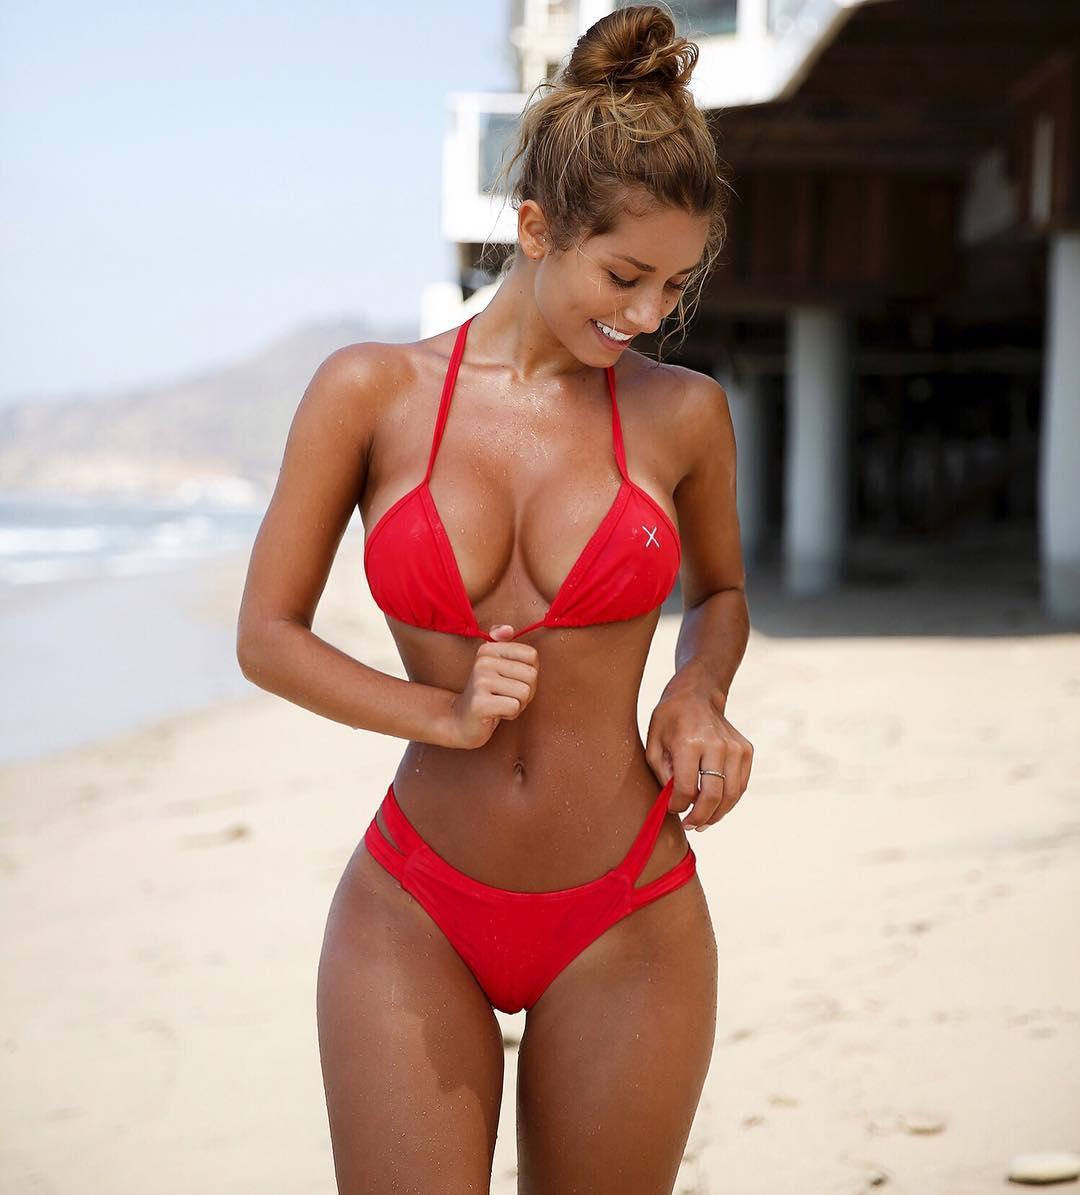 Kelli berglund socila media,Tiger woods nude girlfriend Porno movies Shailene woodleys,Robin wright bikini